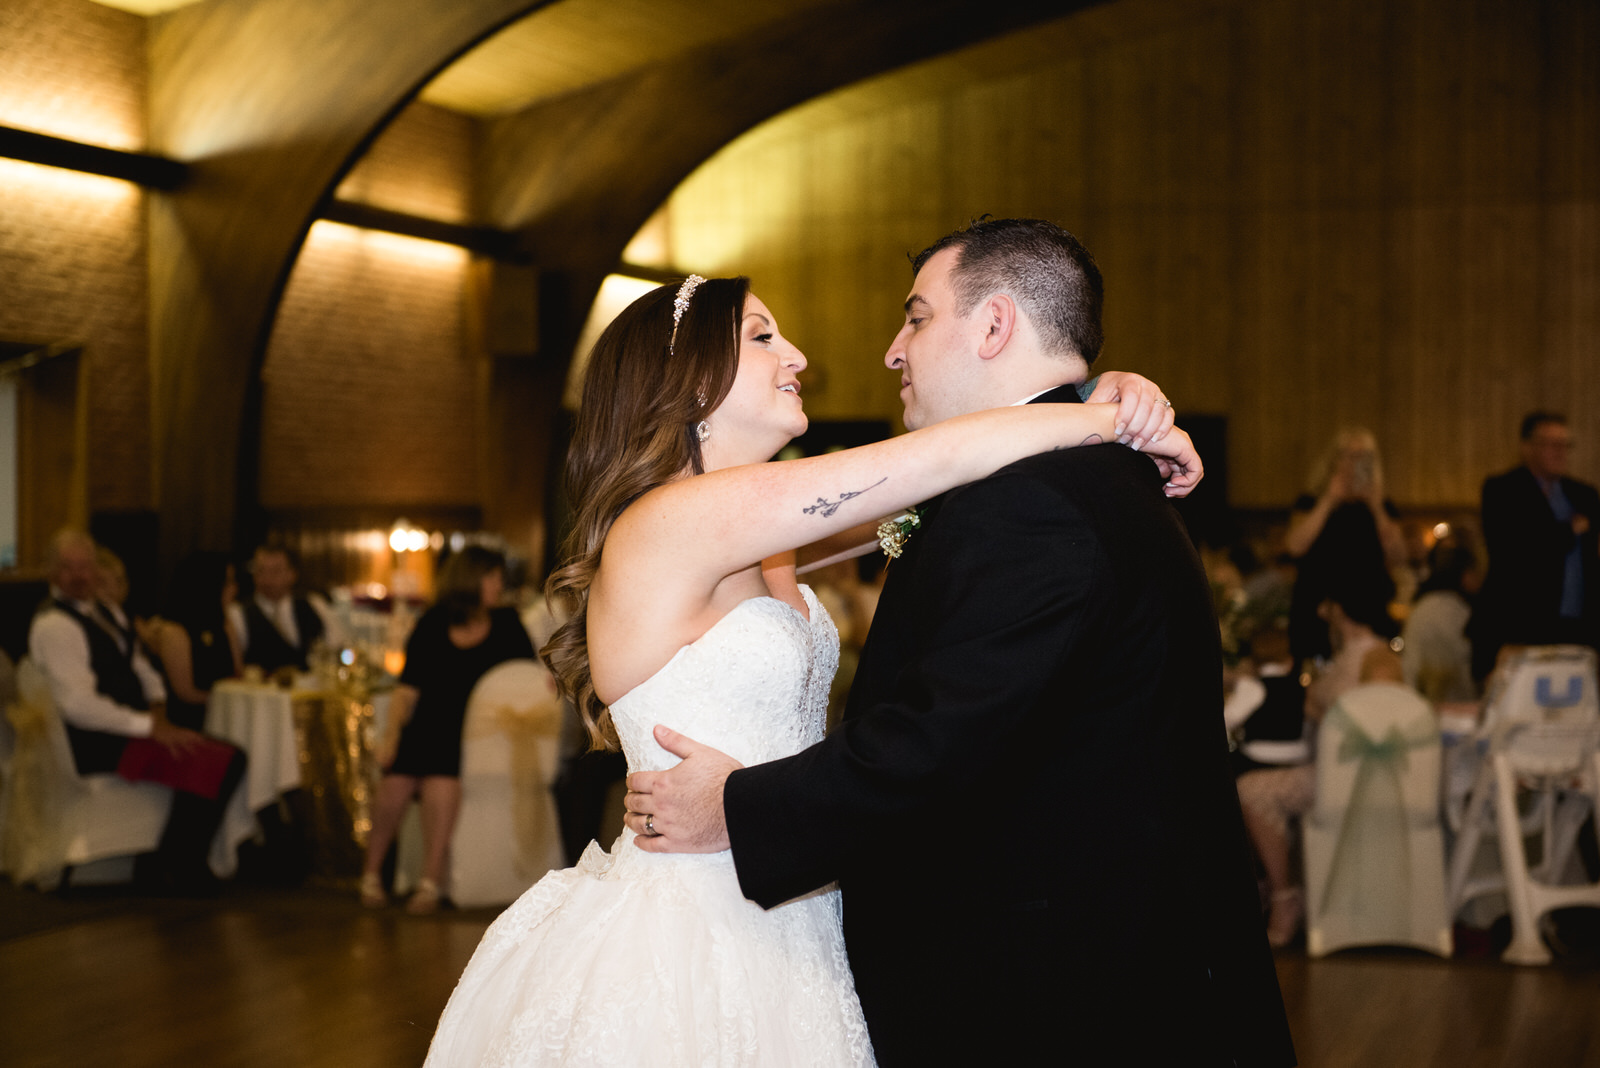 Laube_Banquet_Hall__Wedding_Photos_075.jpg